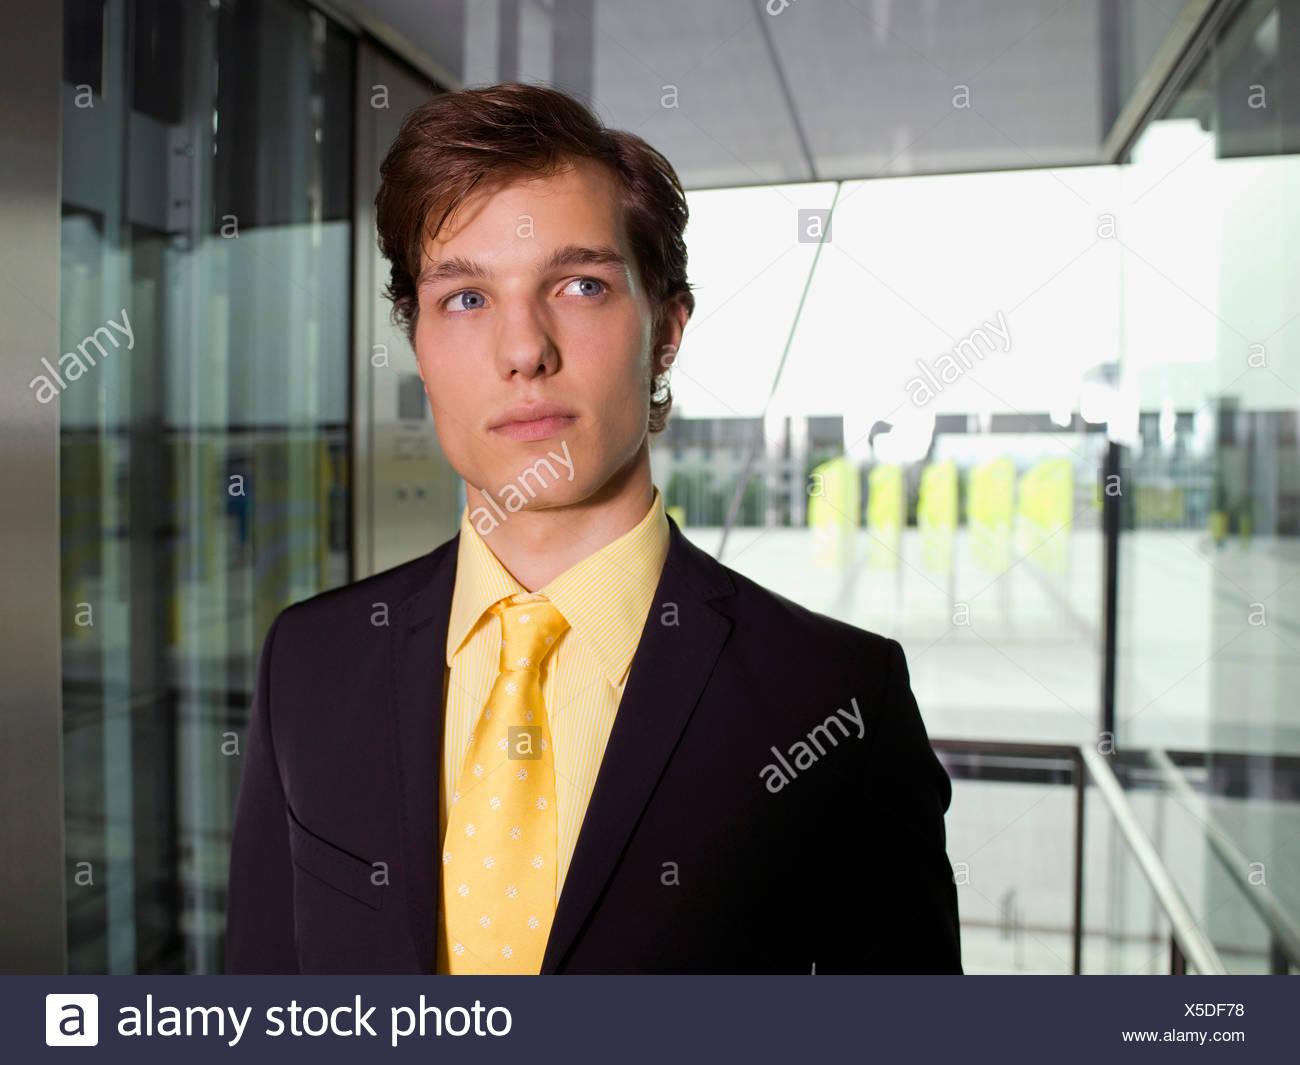 Serious businessman full suit - Stock Image